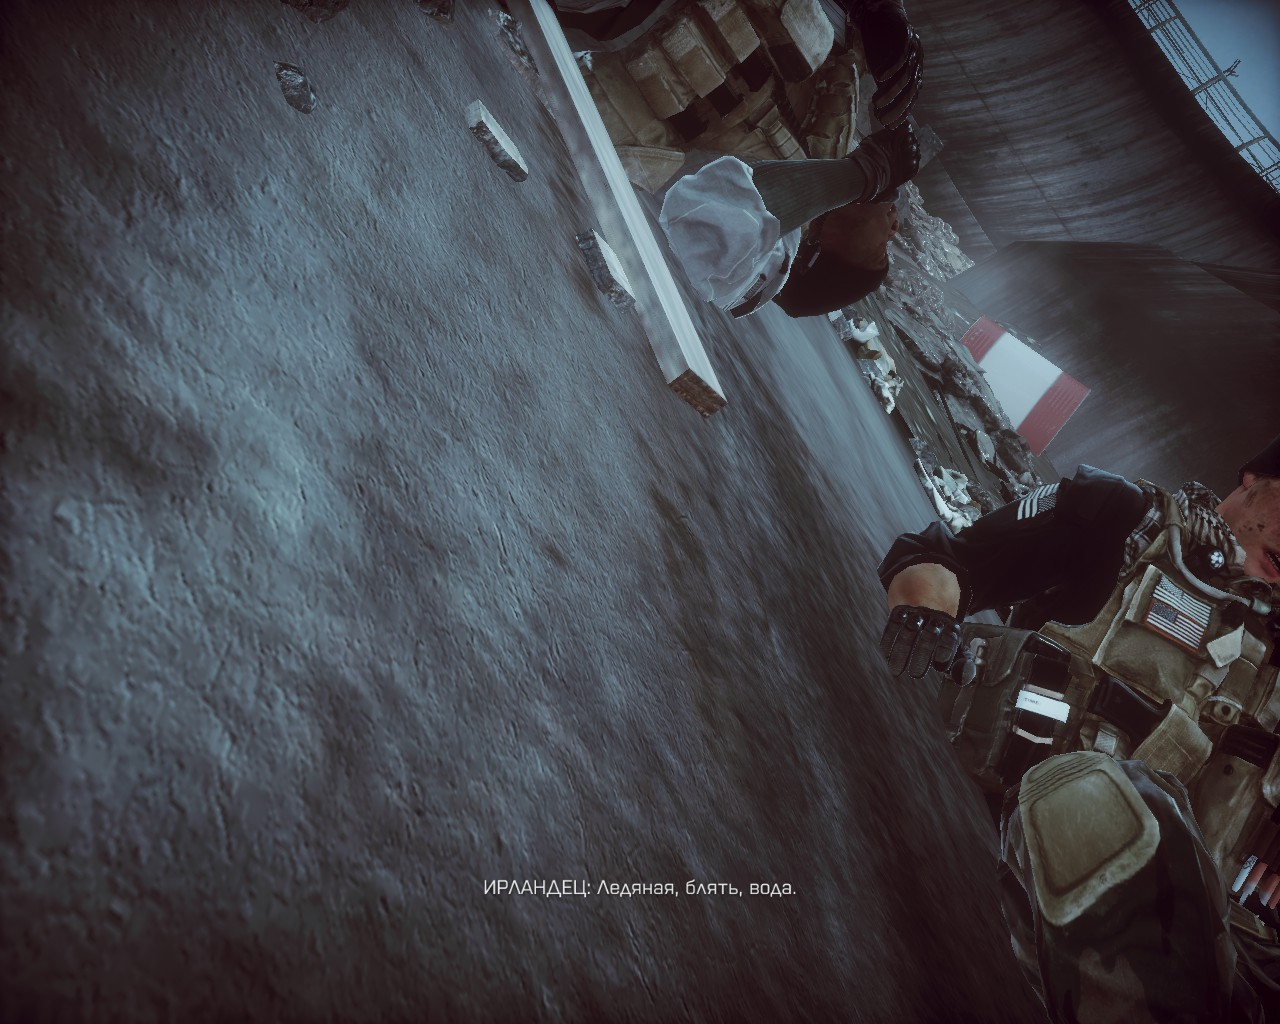 bf4 2014-04-05 01-39-44-36.jpg - Battlefield 4